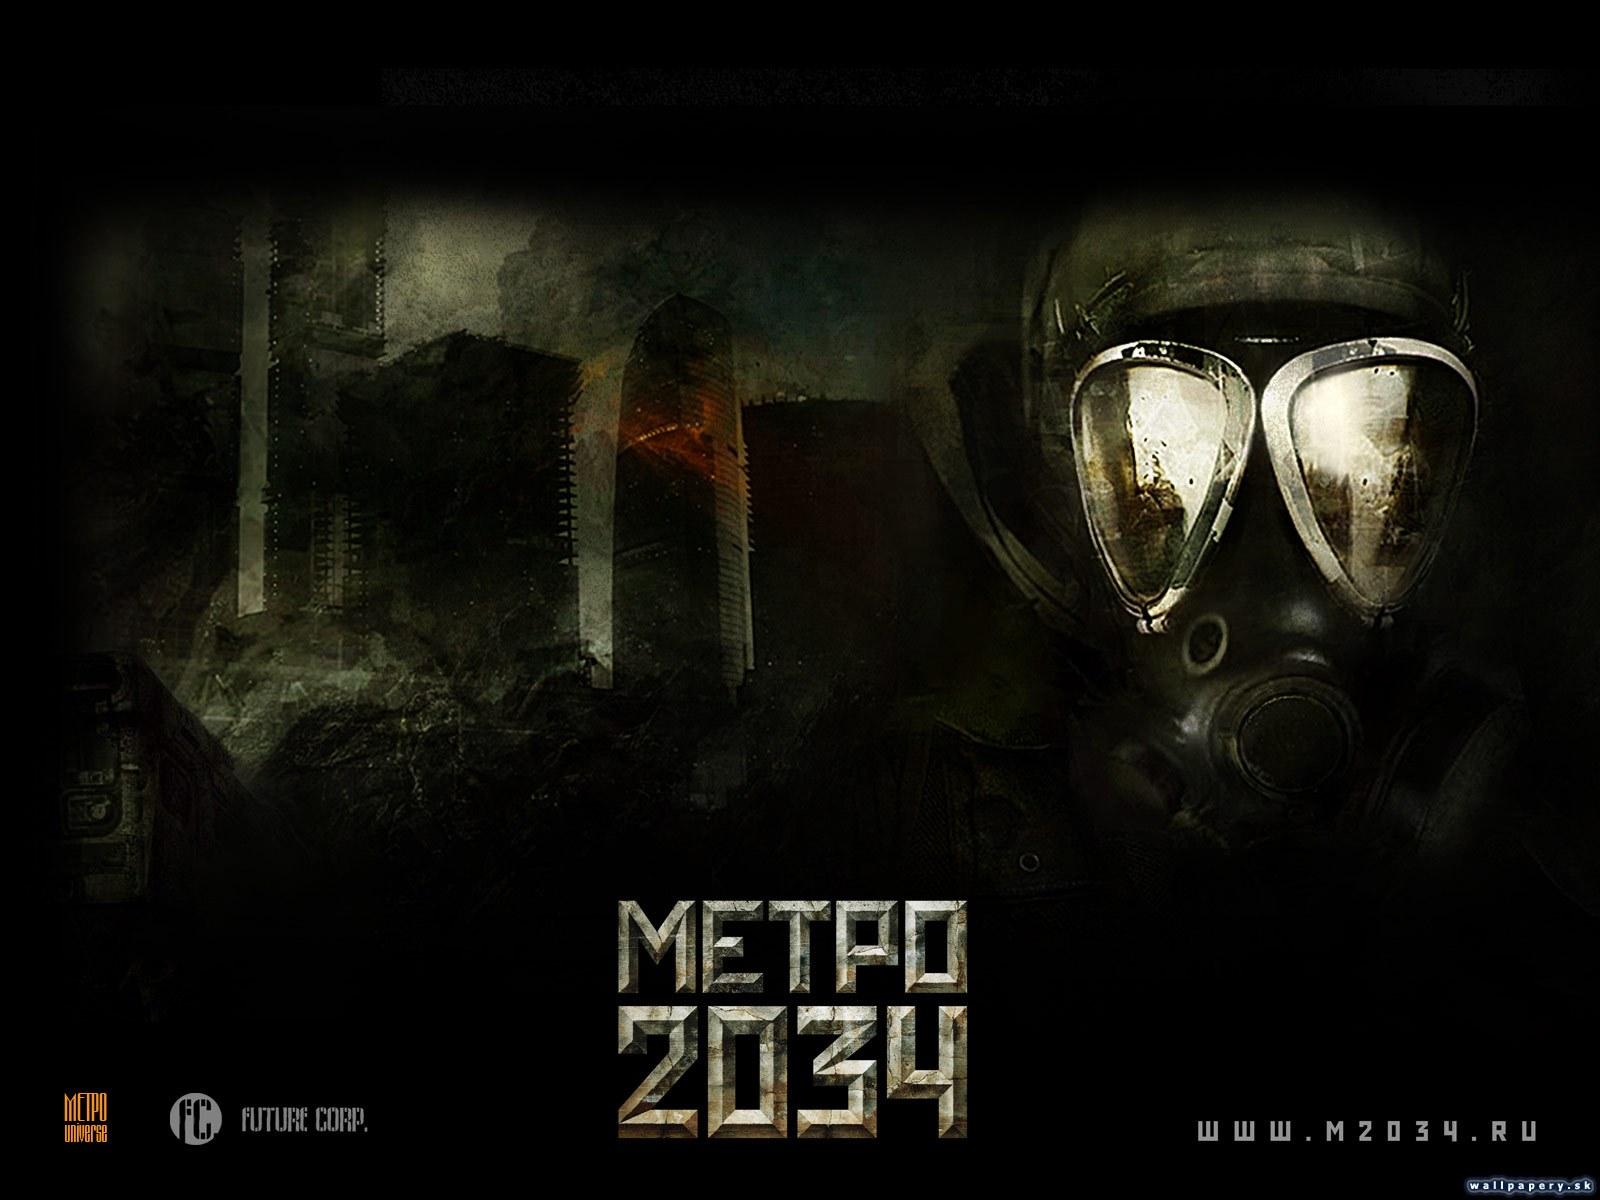 Metro 2033 Wallpaper Hd Metro Last Light Acording Book Metro 2034 Image